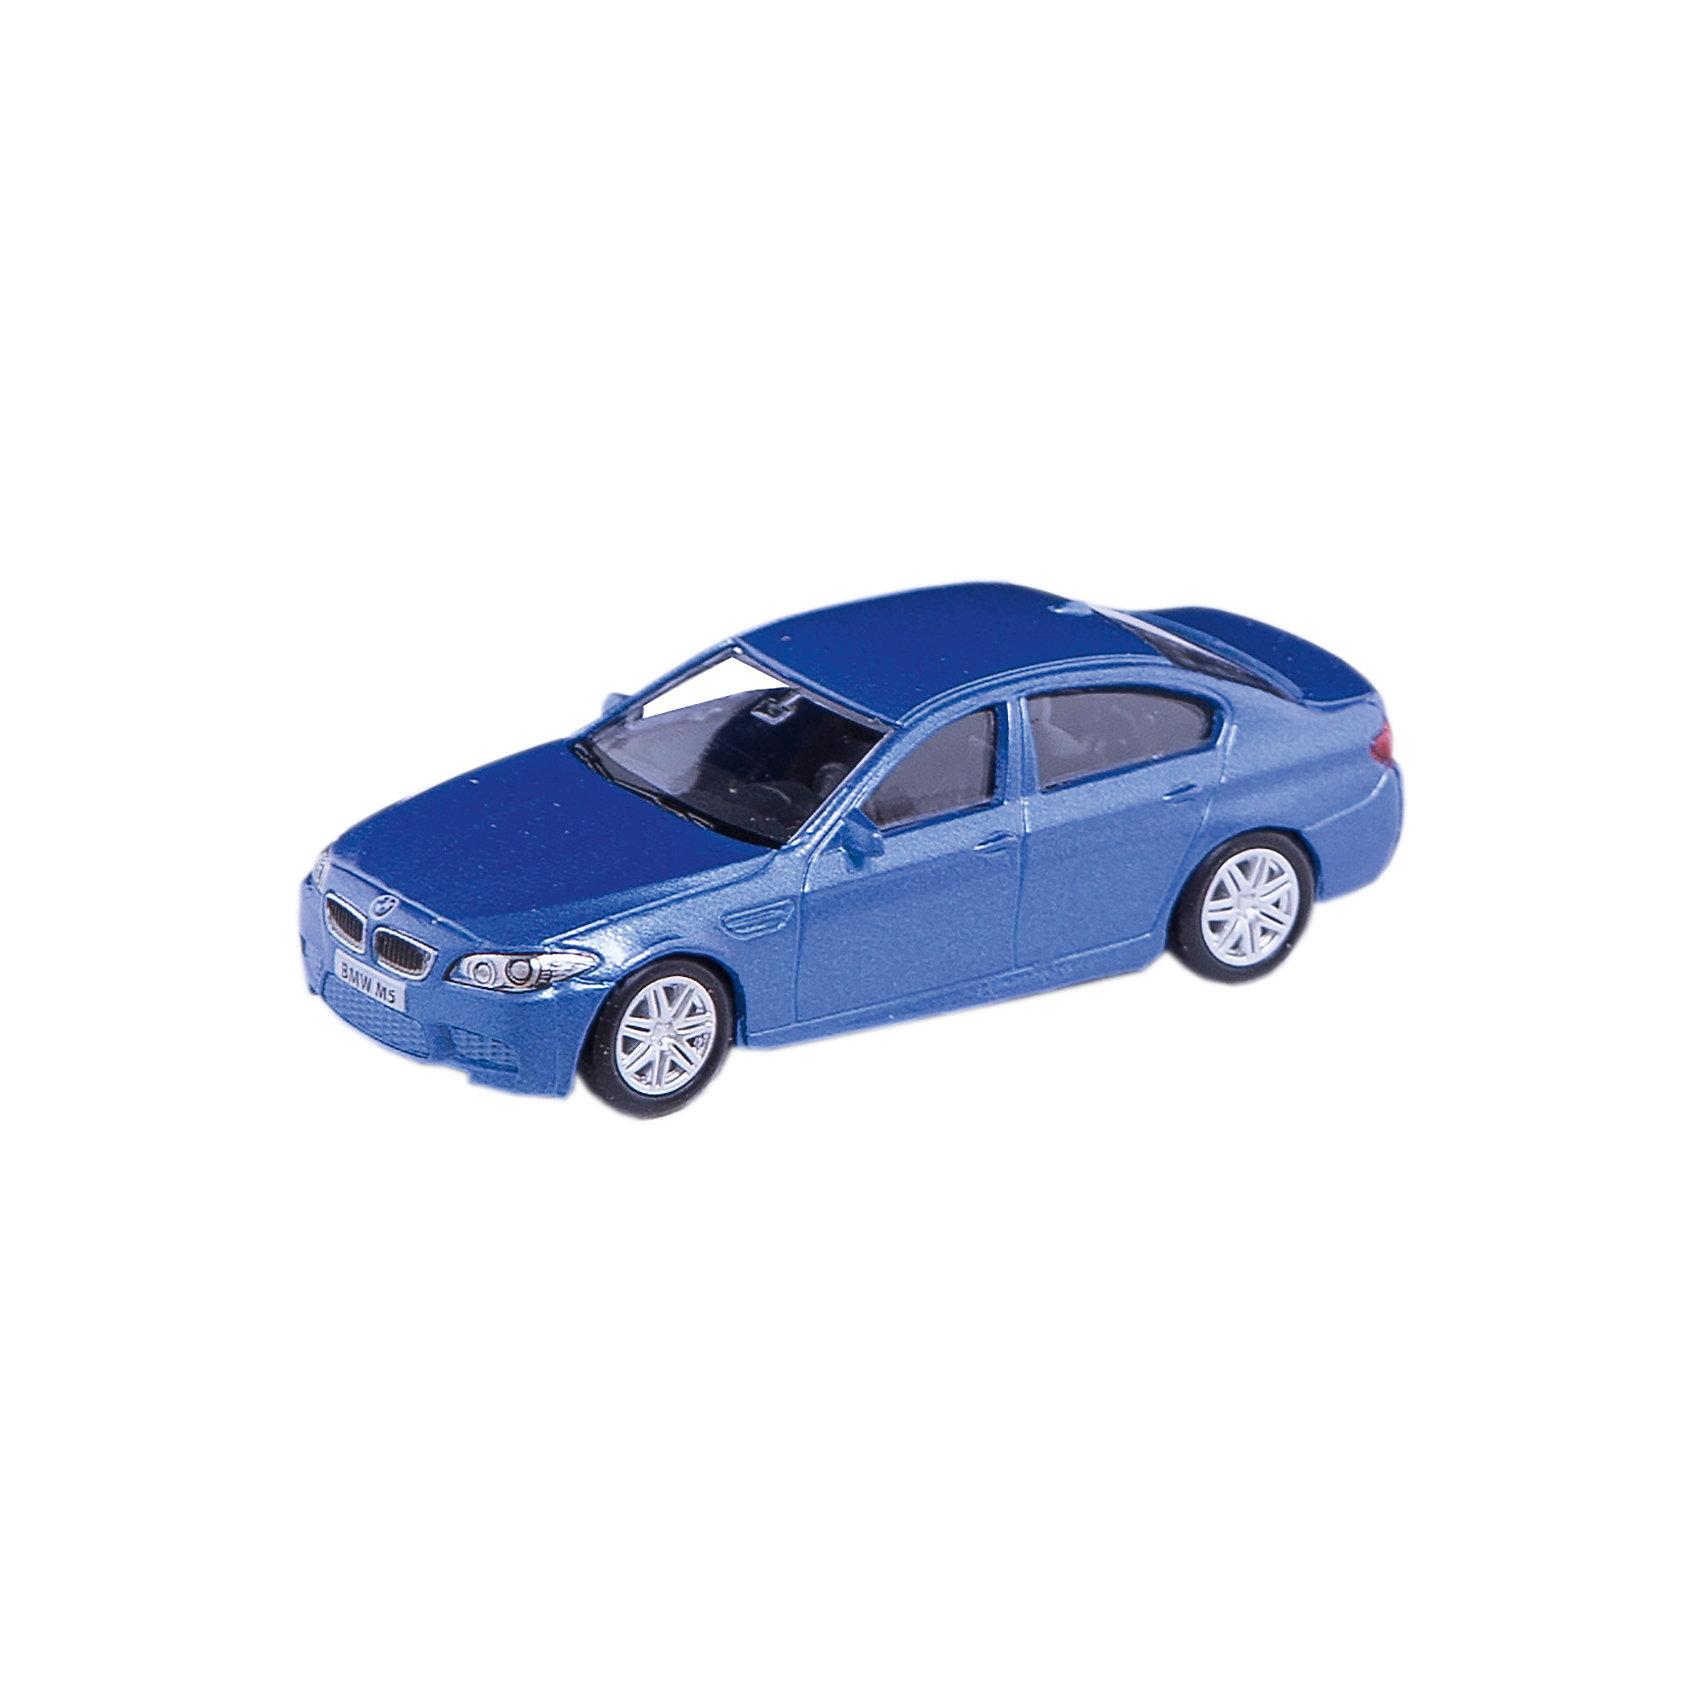 Машинка BMW M5 1:64, AutotimeМашинки<br><br><br>Ширина мм: 90<br>Глубина мм: 42<br>Высота мм: 40<br>Вес г: 13<br>Возраст от месяцев: 36<br>Возраст до месяцев: 2147483647<br>Пол: Мужской<br>Возраст: Детский<br>SKU: 5584081